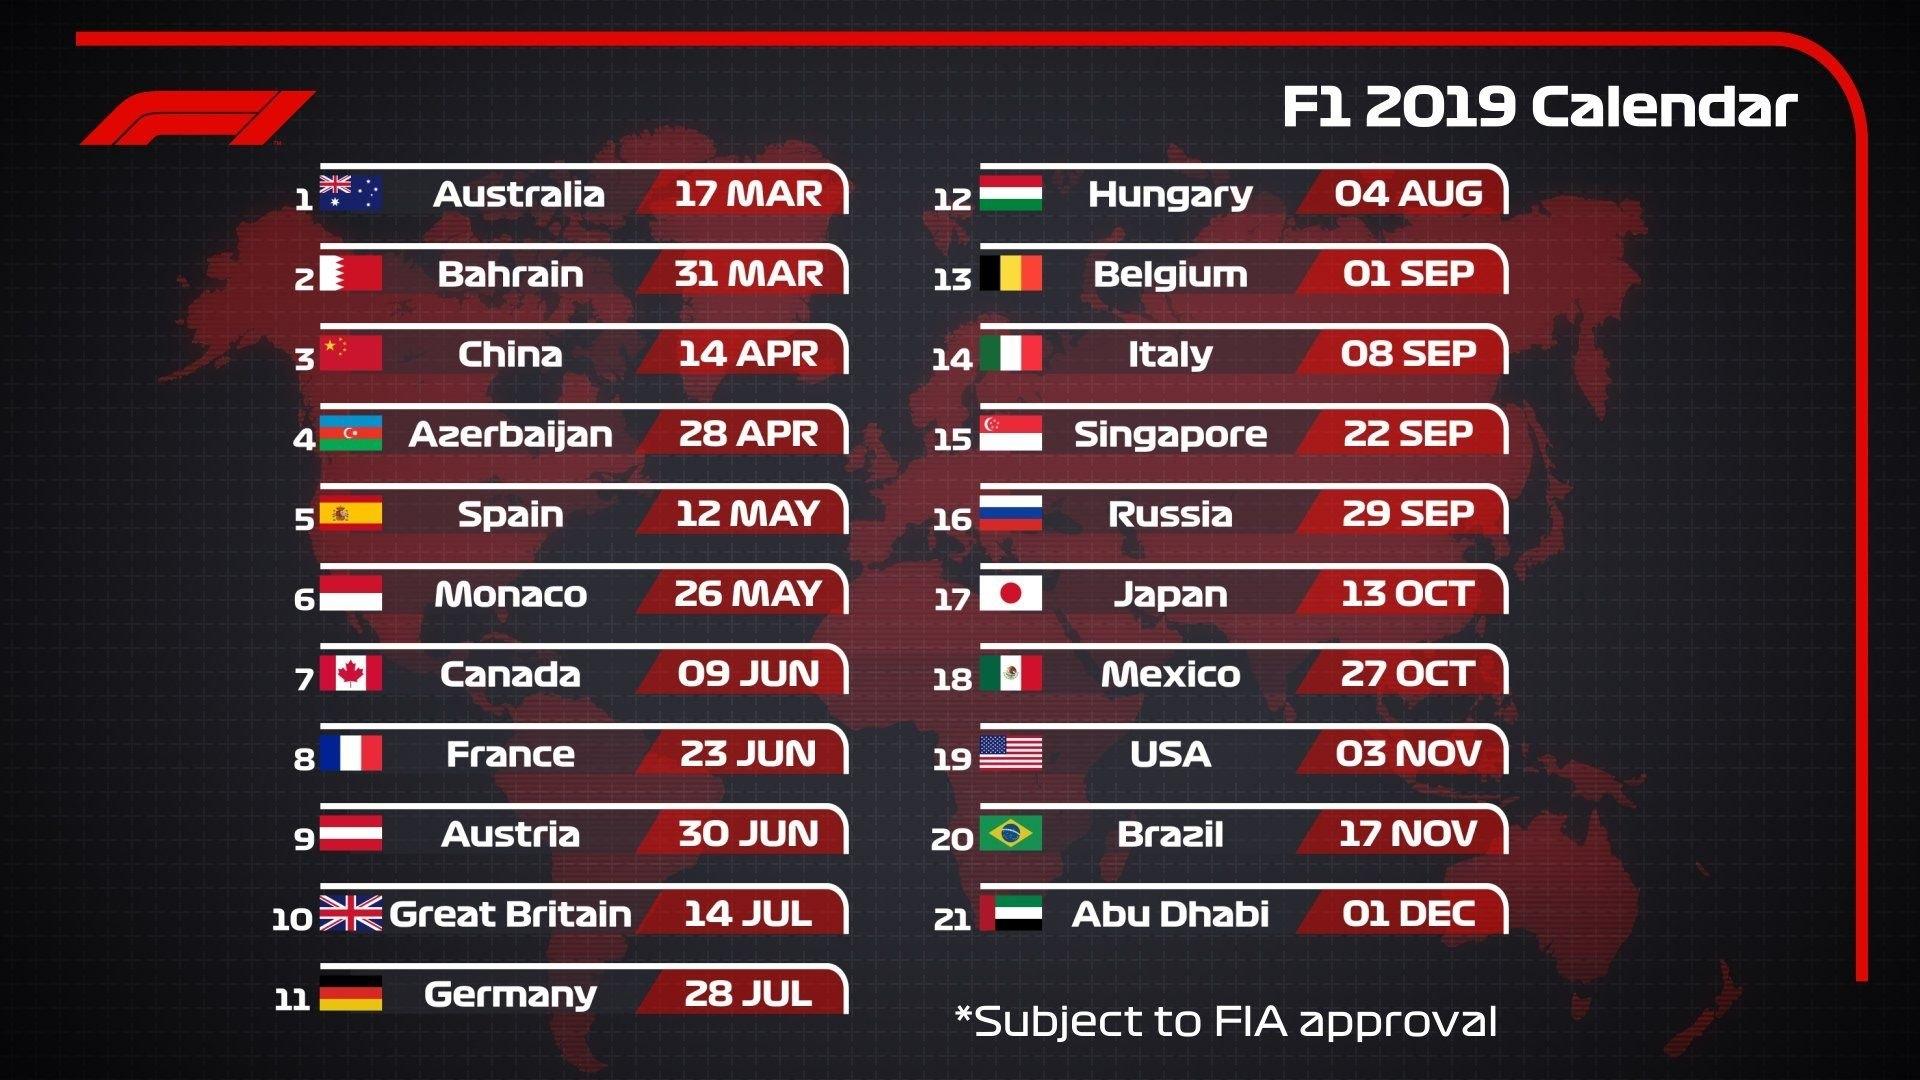 2019 F1 Calendar | F1 2018 2019 F1 Calendar